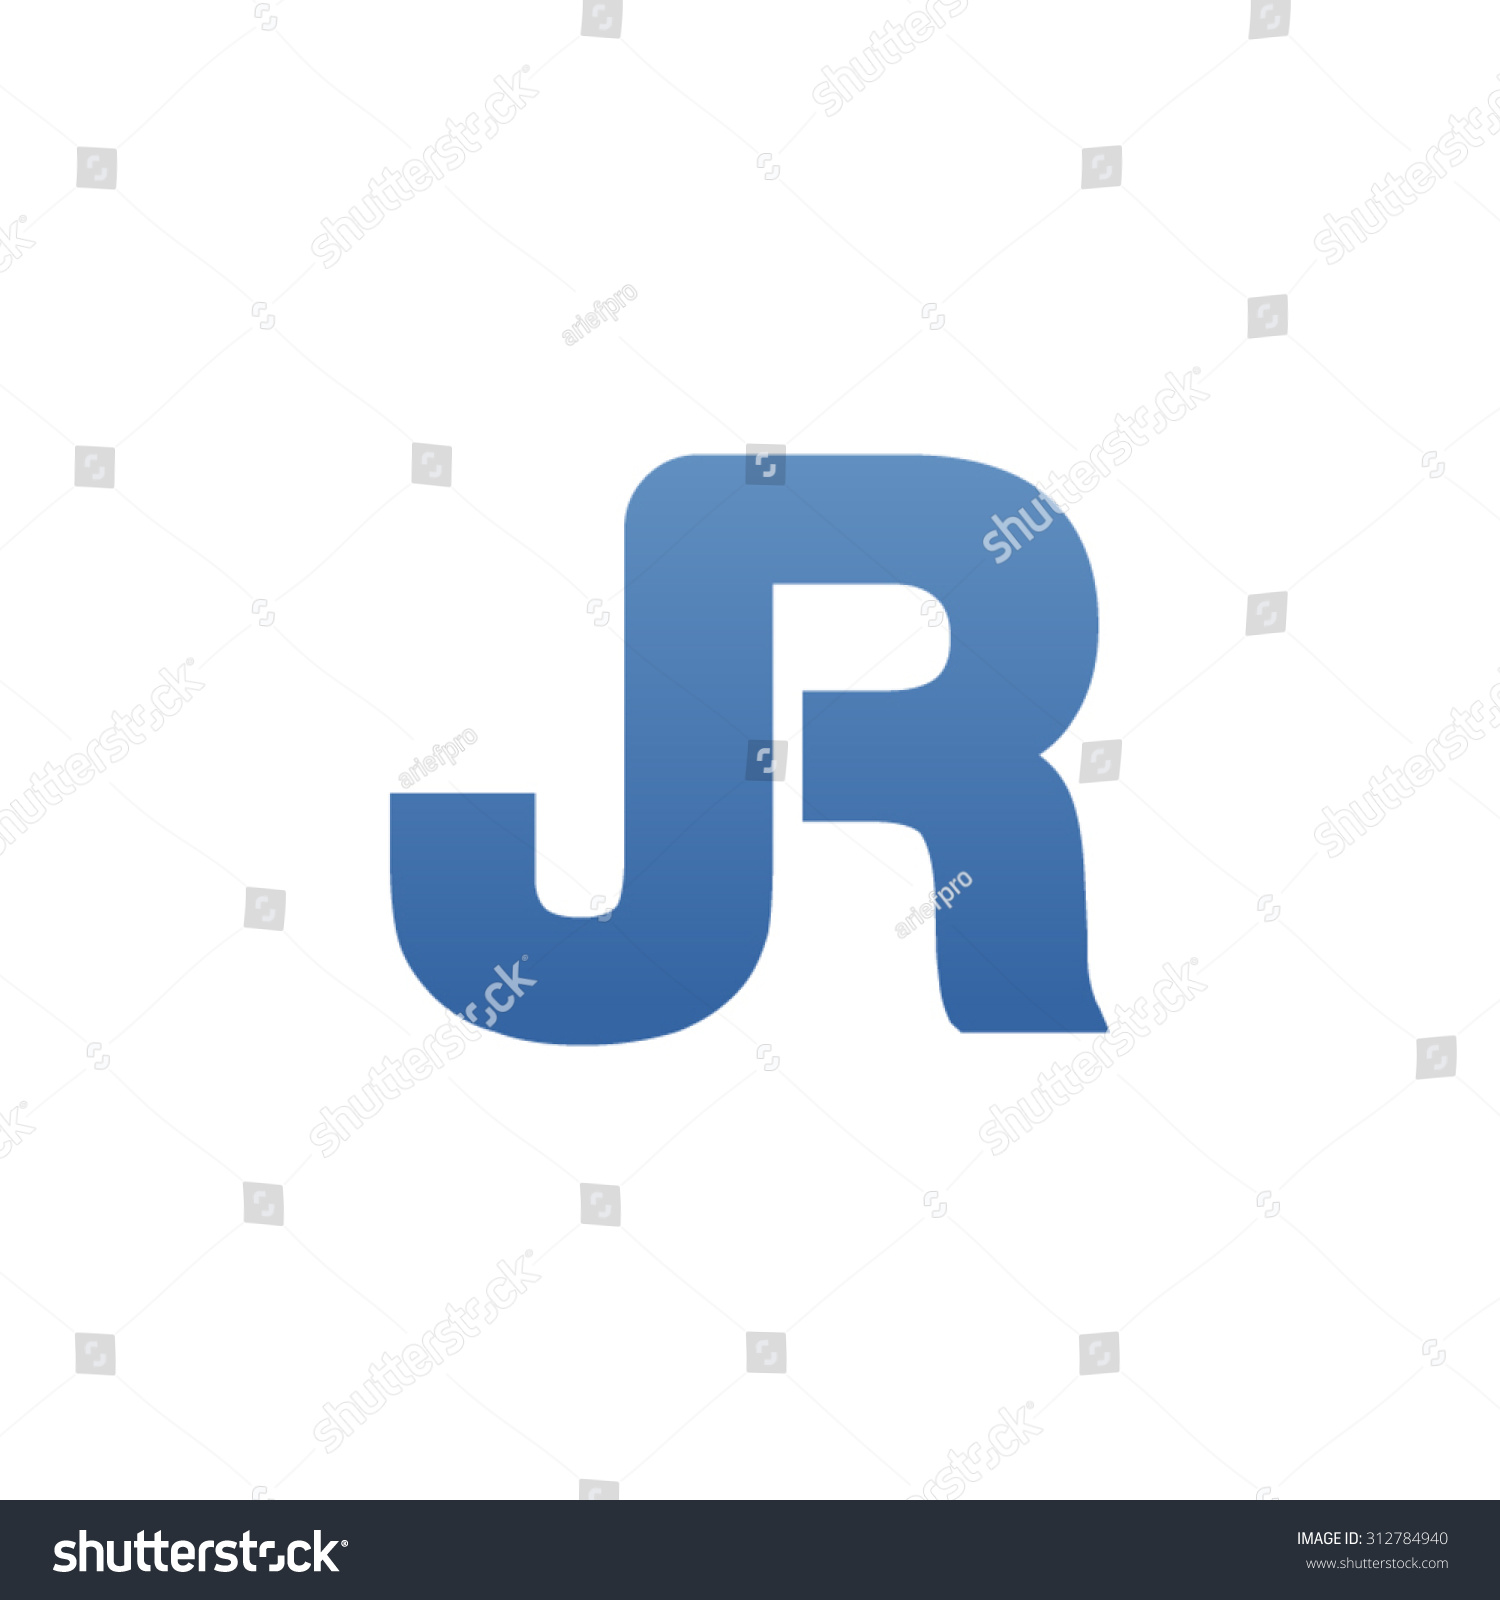 Tj initial luxury ornament monogram logo stock vector - Jr Letter Icon Logo Connected